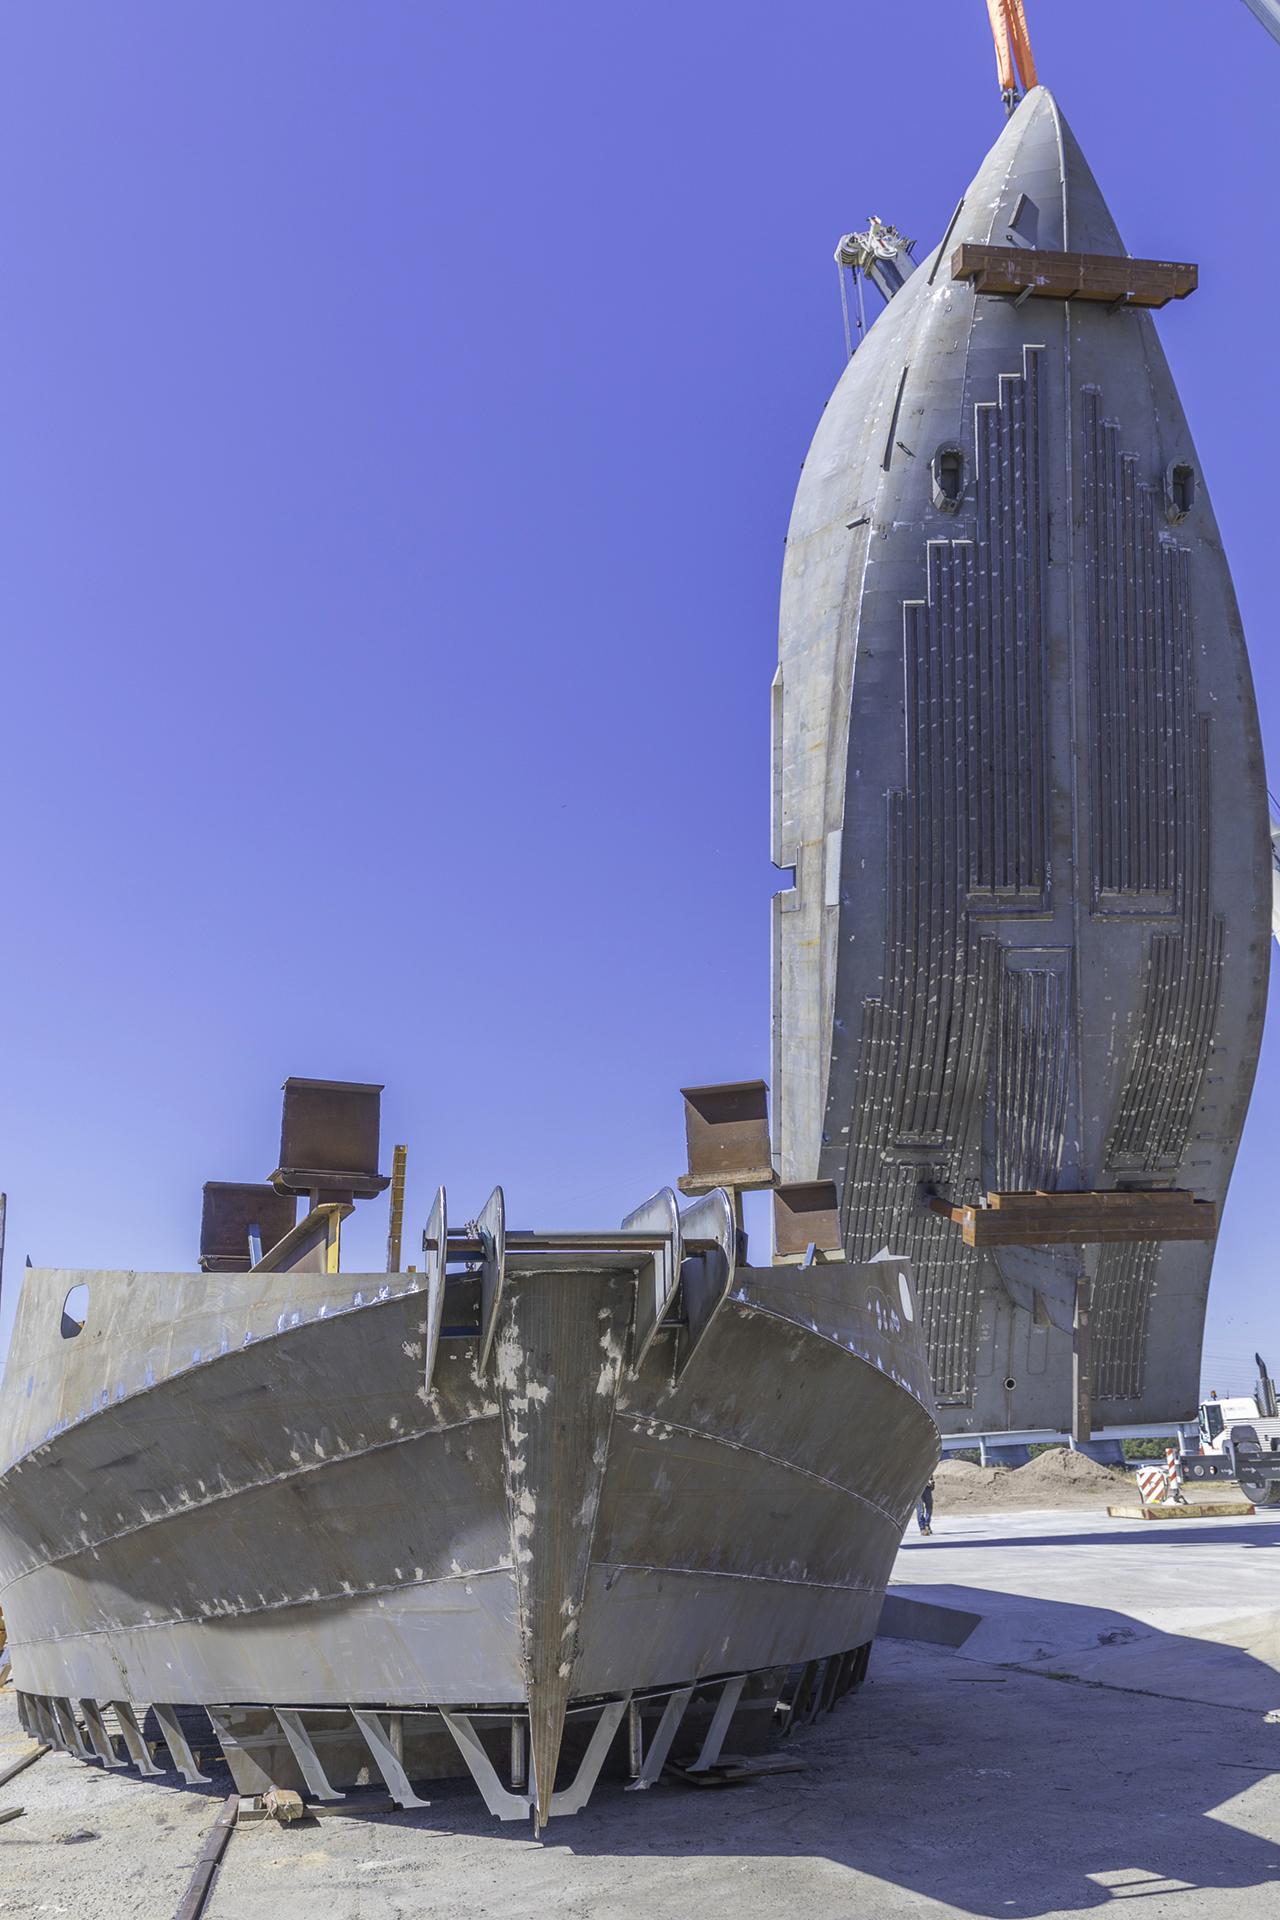 mg-eng-scampi-trawler-hull-turning-3.jpg